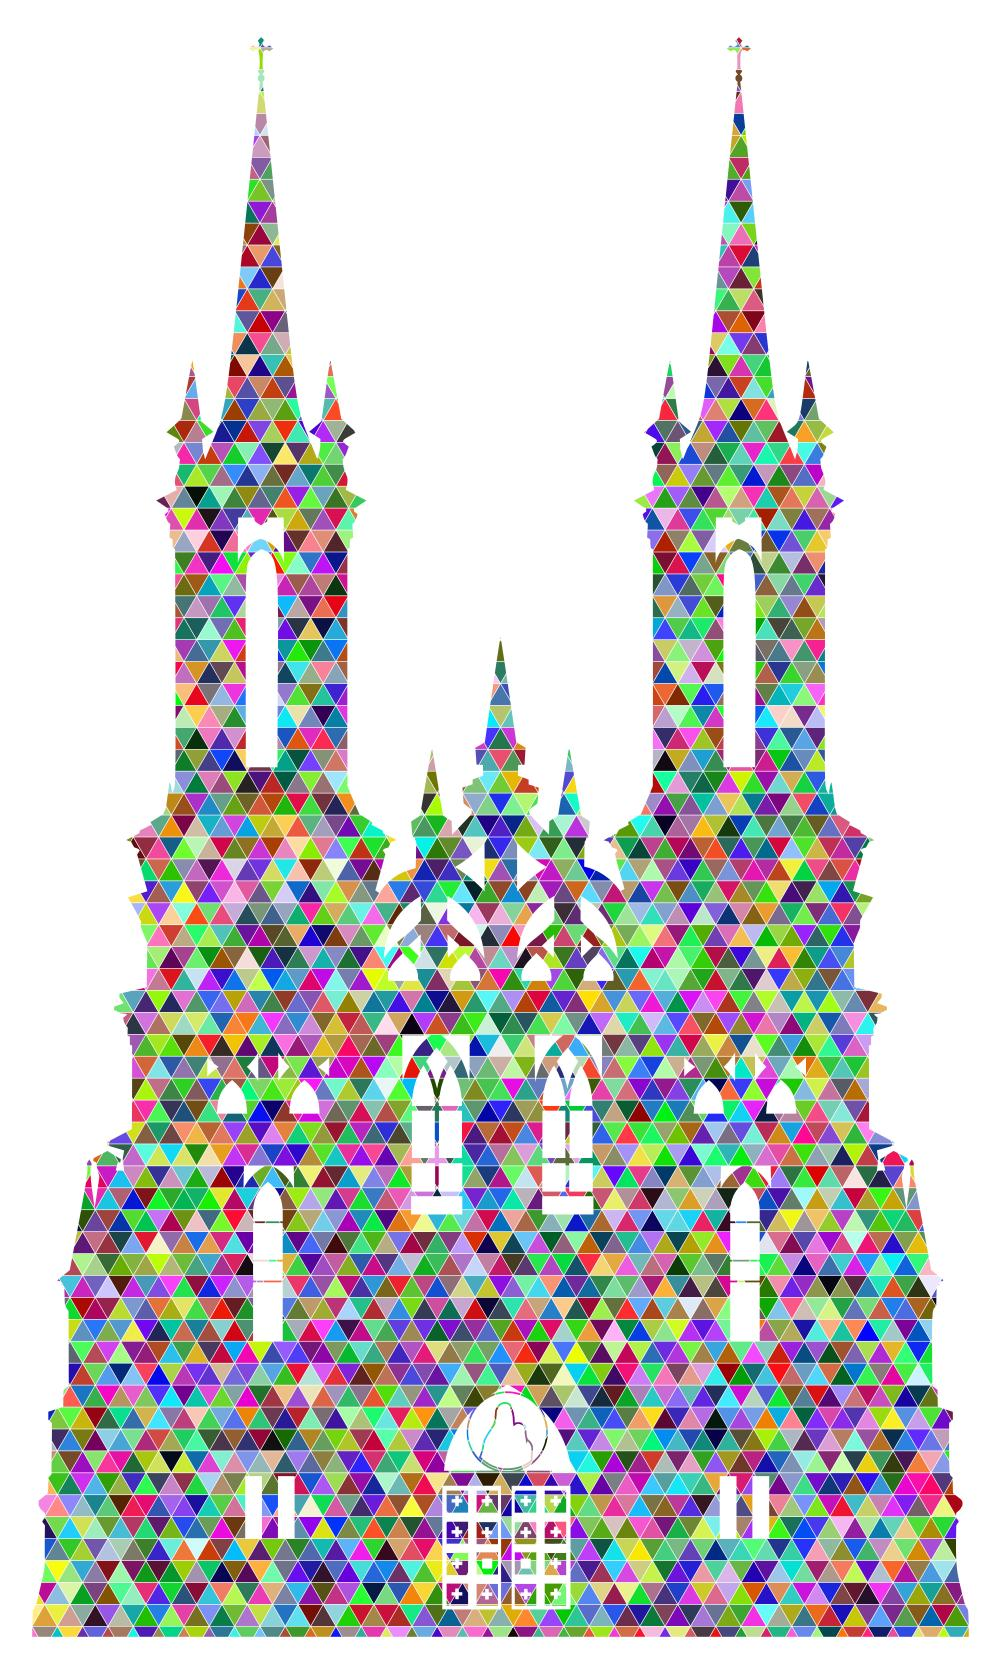 1001x1674 Prismatic Triangular Mosaic Gothic Castle Silhouette Clipart